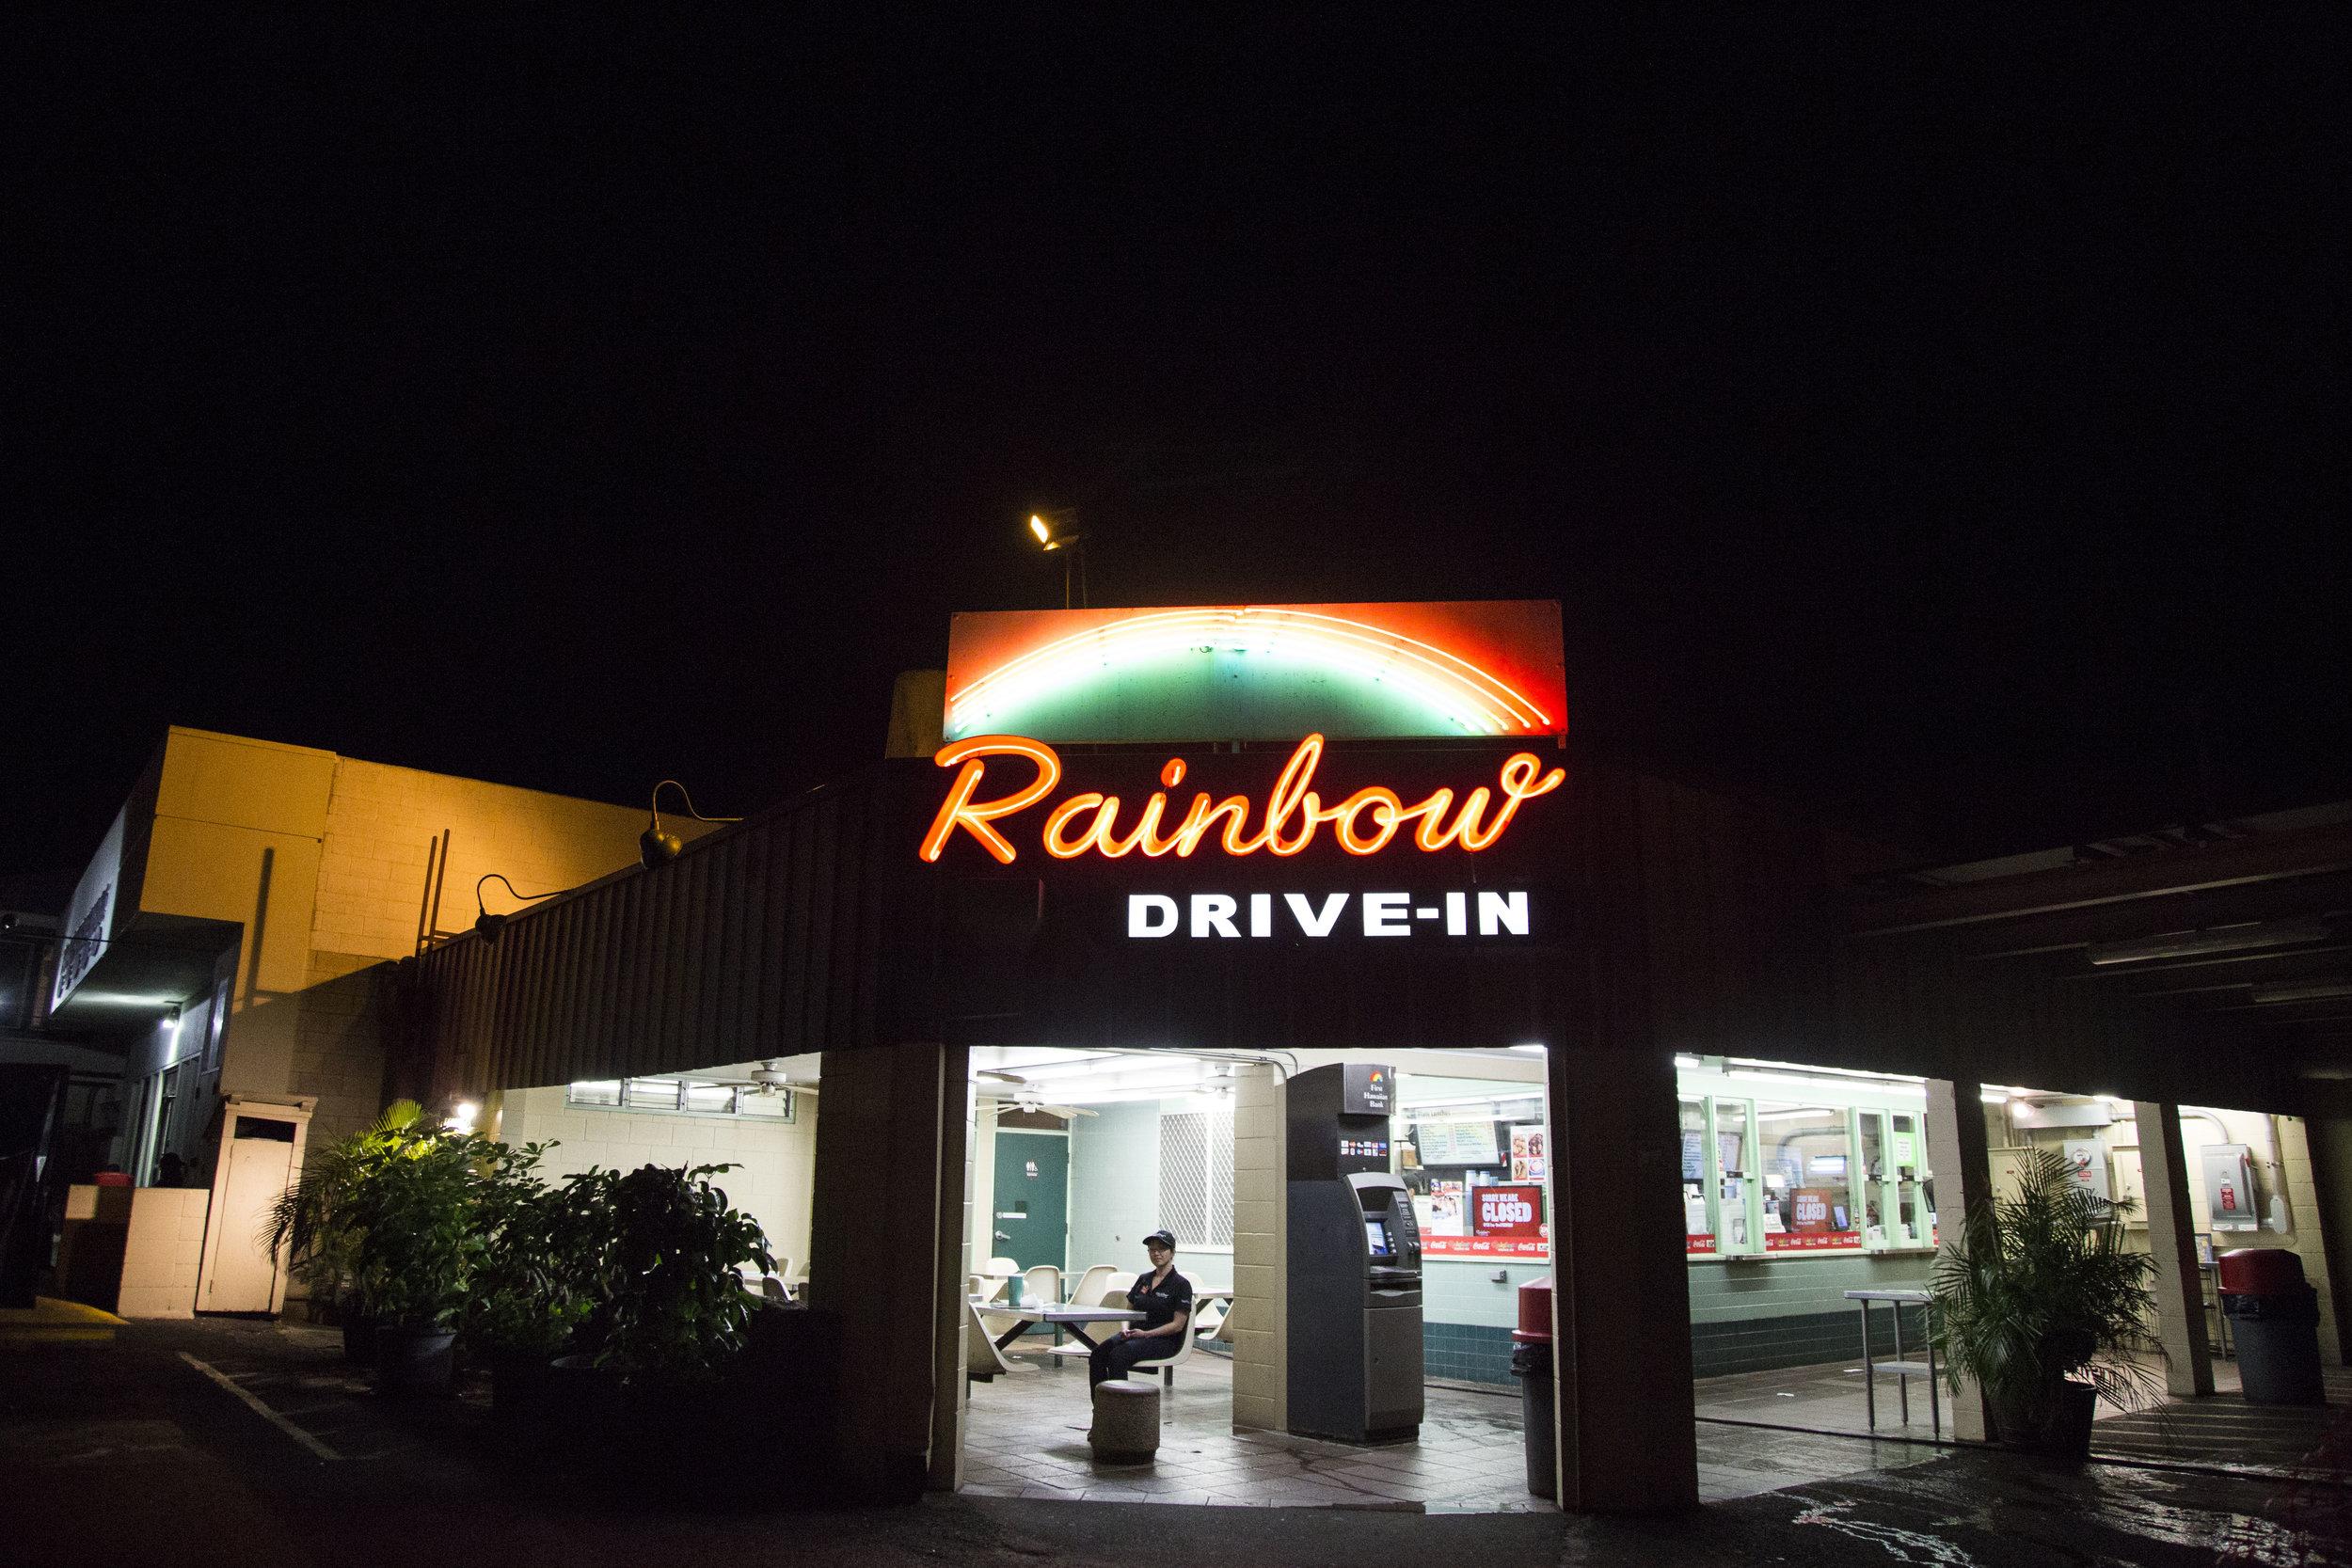 RainbowDriveIn08.JPG